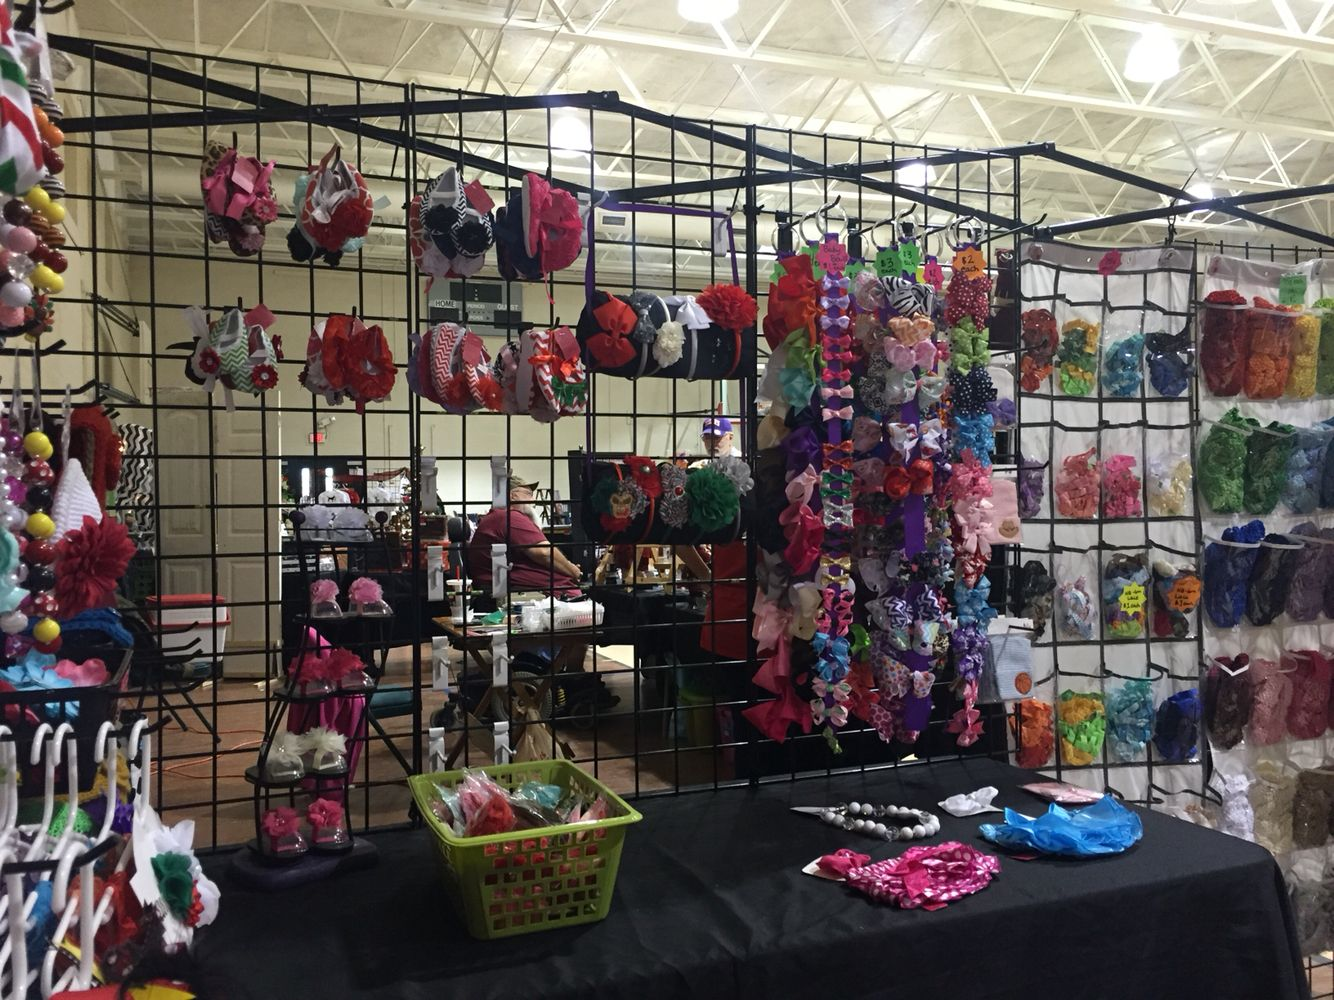 Vendor Booth Craft Fair Holiday Bazaar Set Up Idea Display